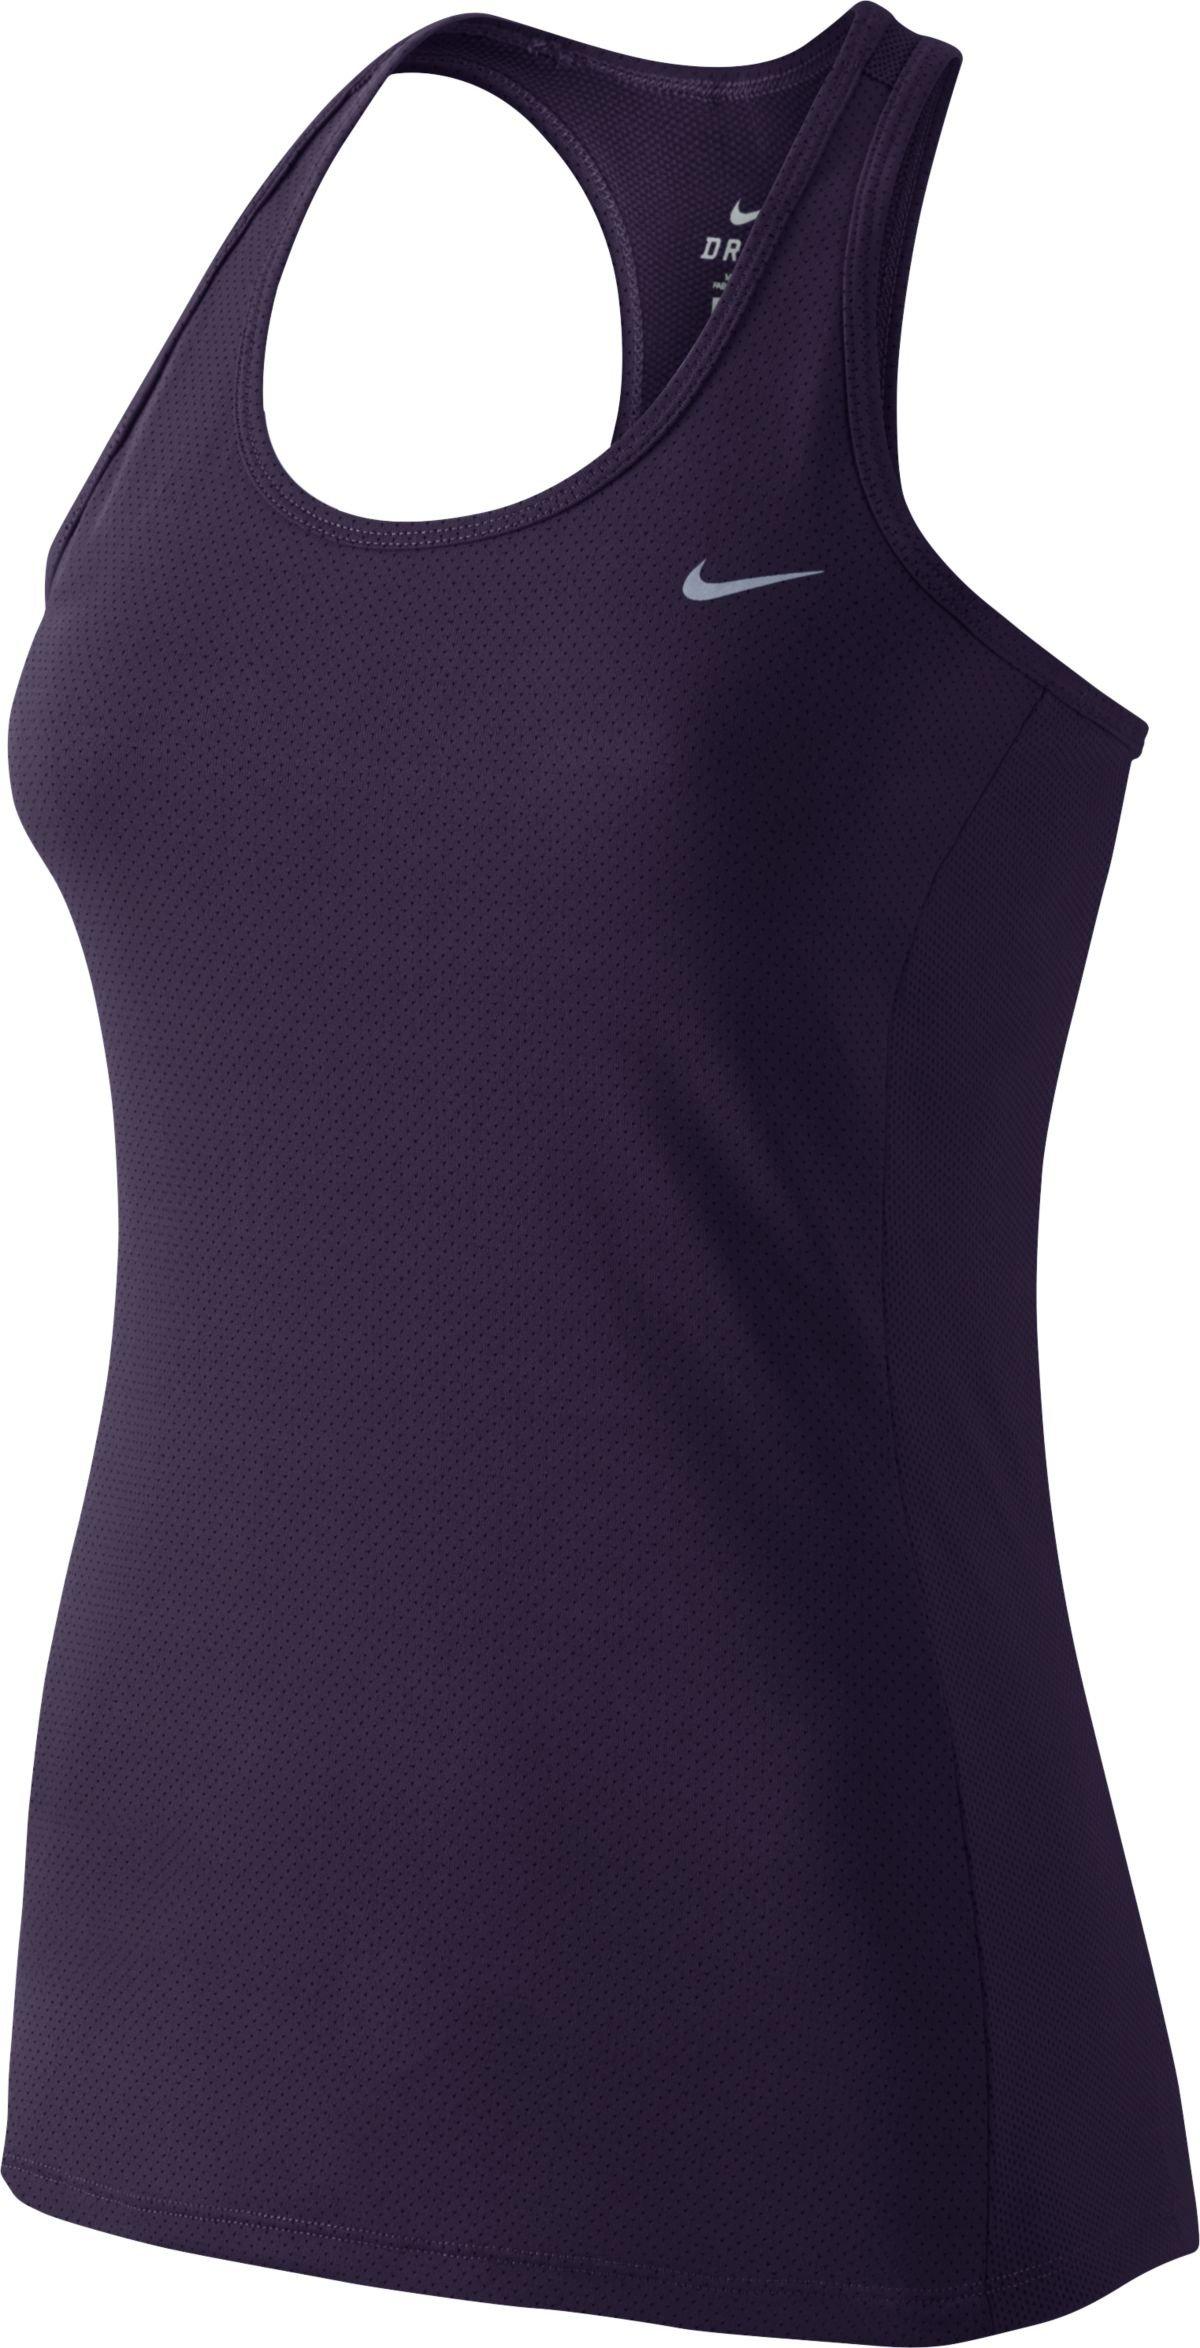 Tílko Nike DRI-FIT CONTOUR TANK